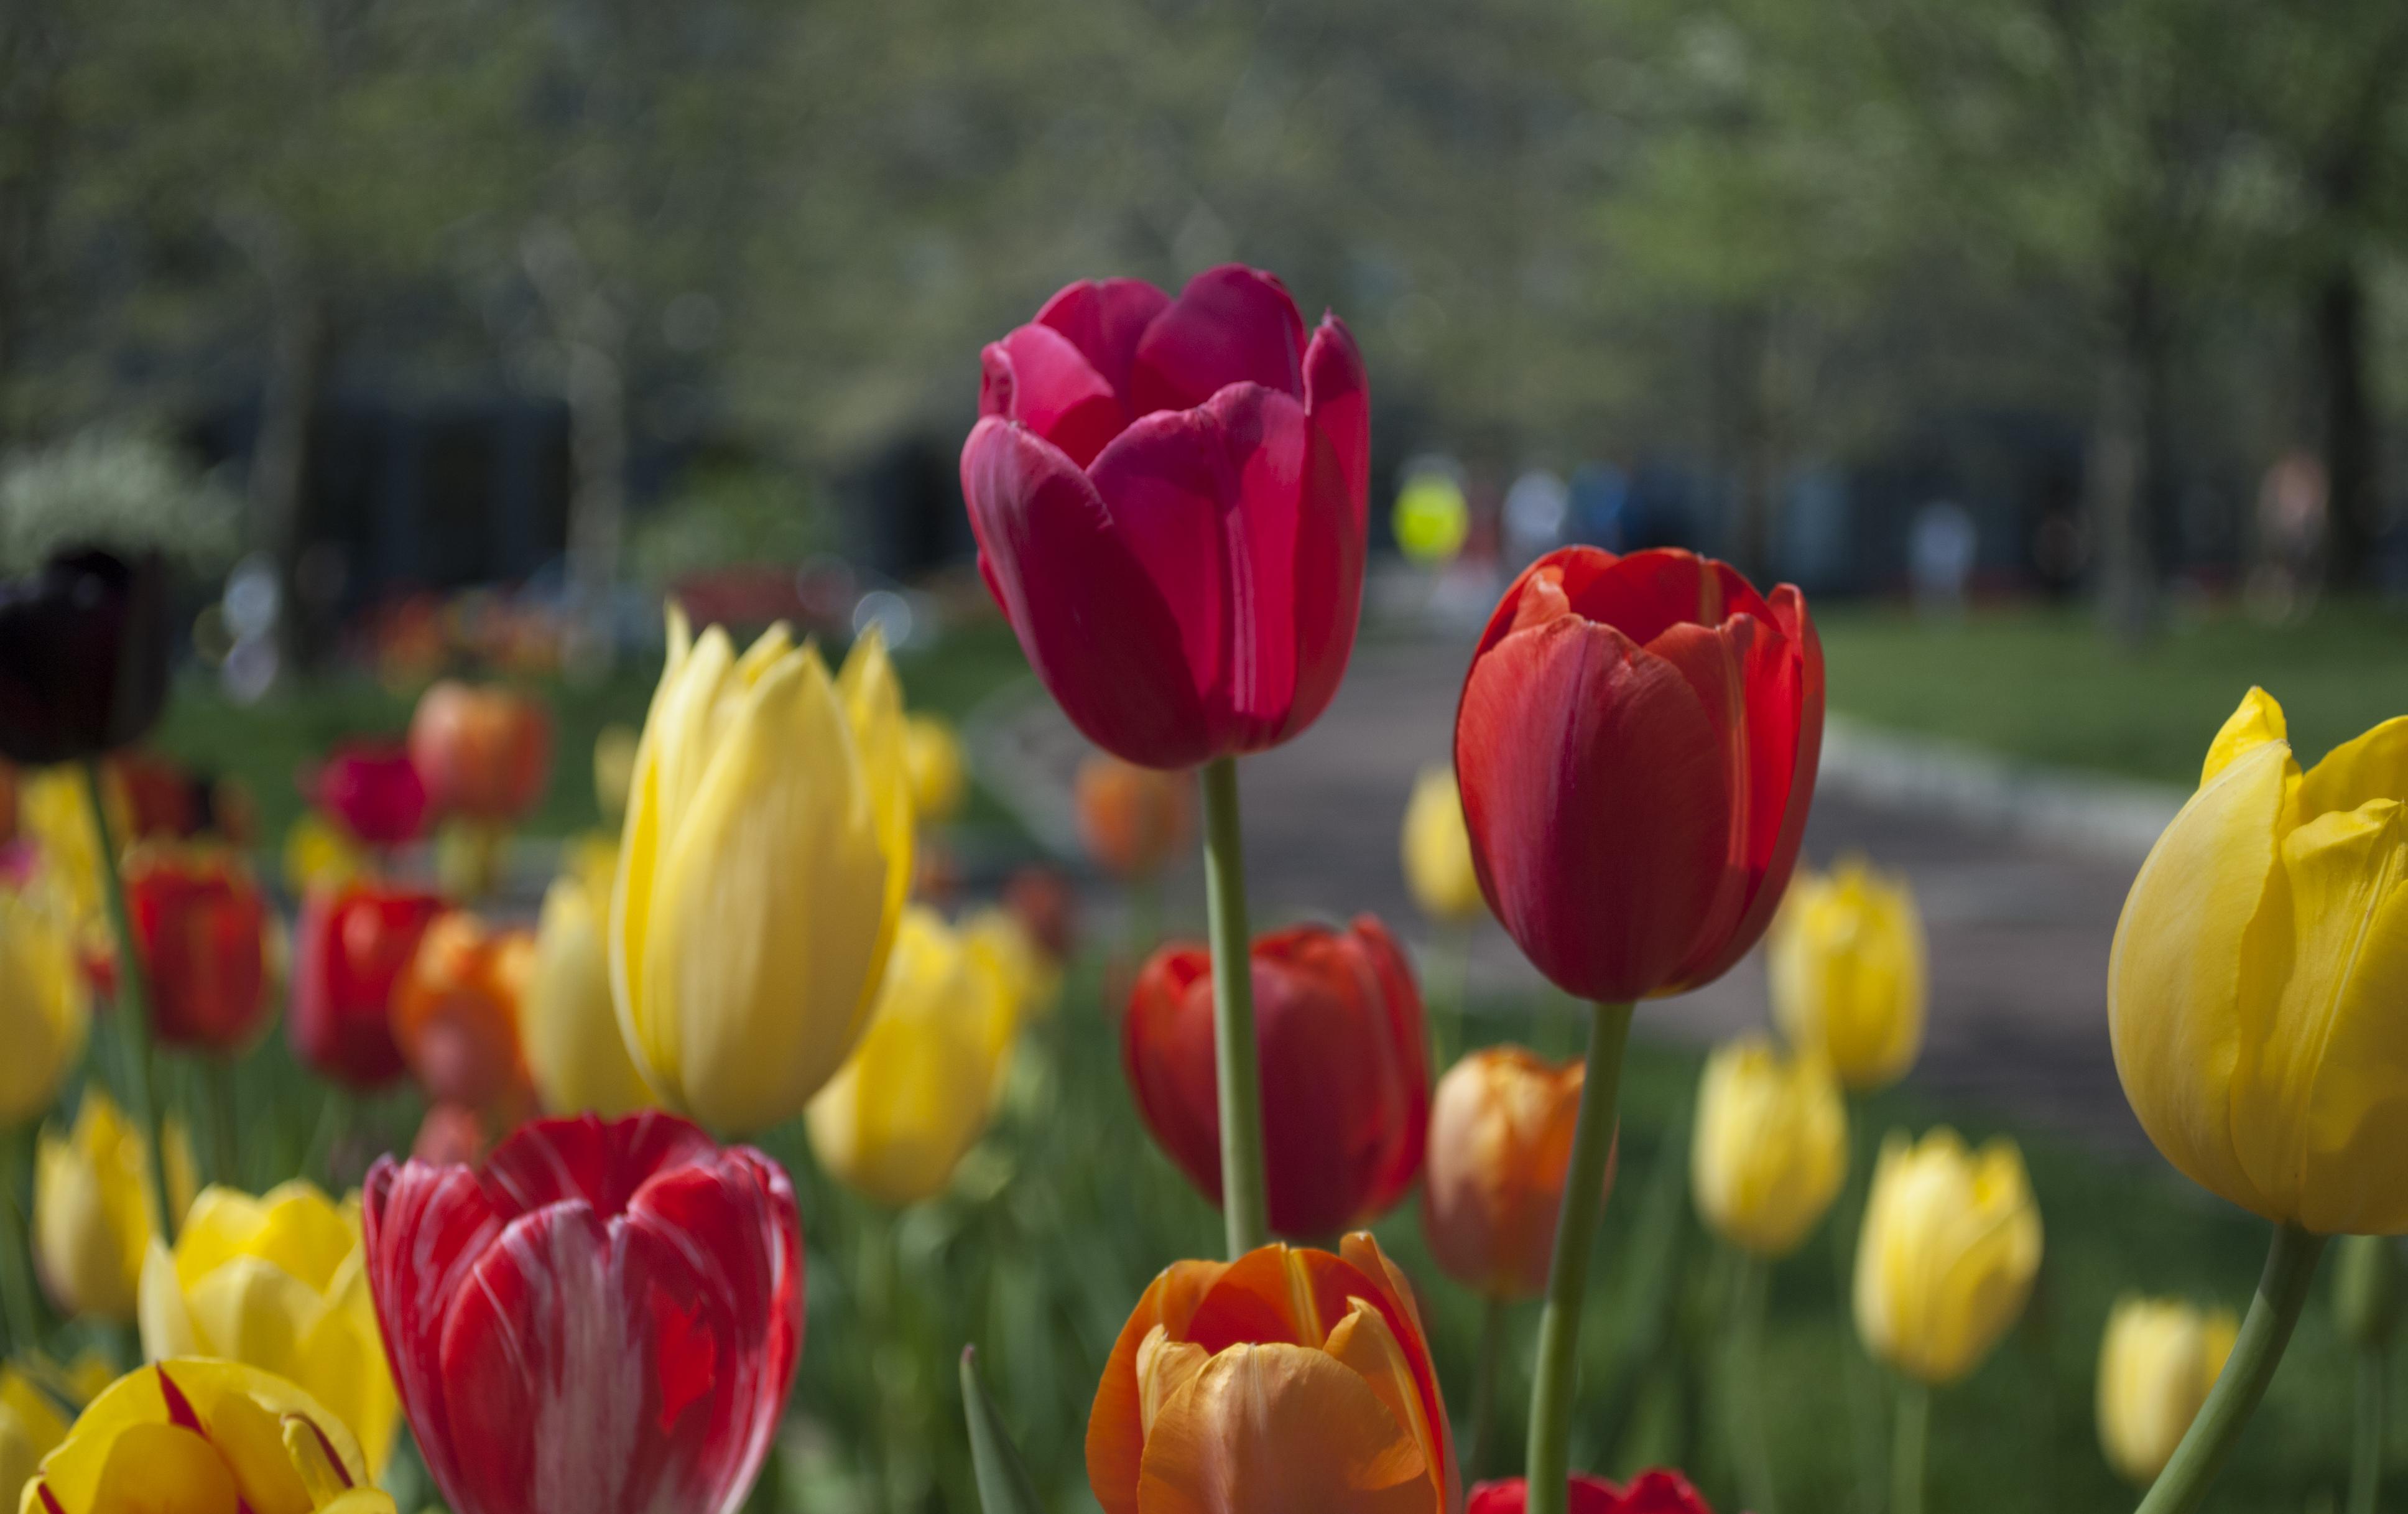 free images : petal, floral, tulip, flora, flowers, tulips, macro